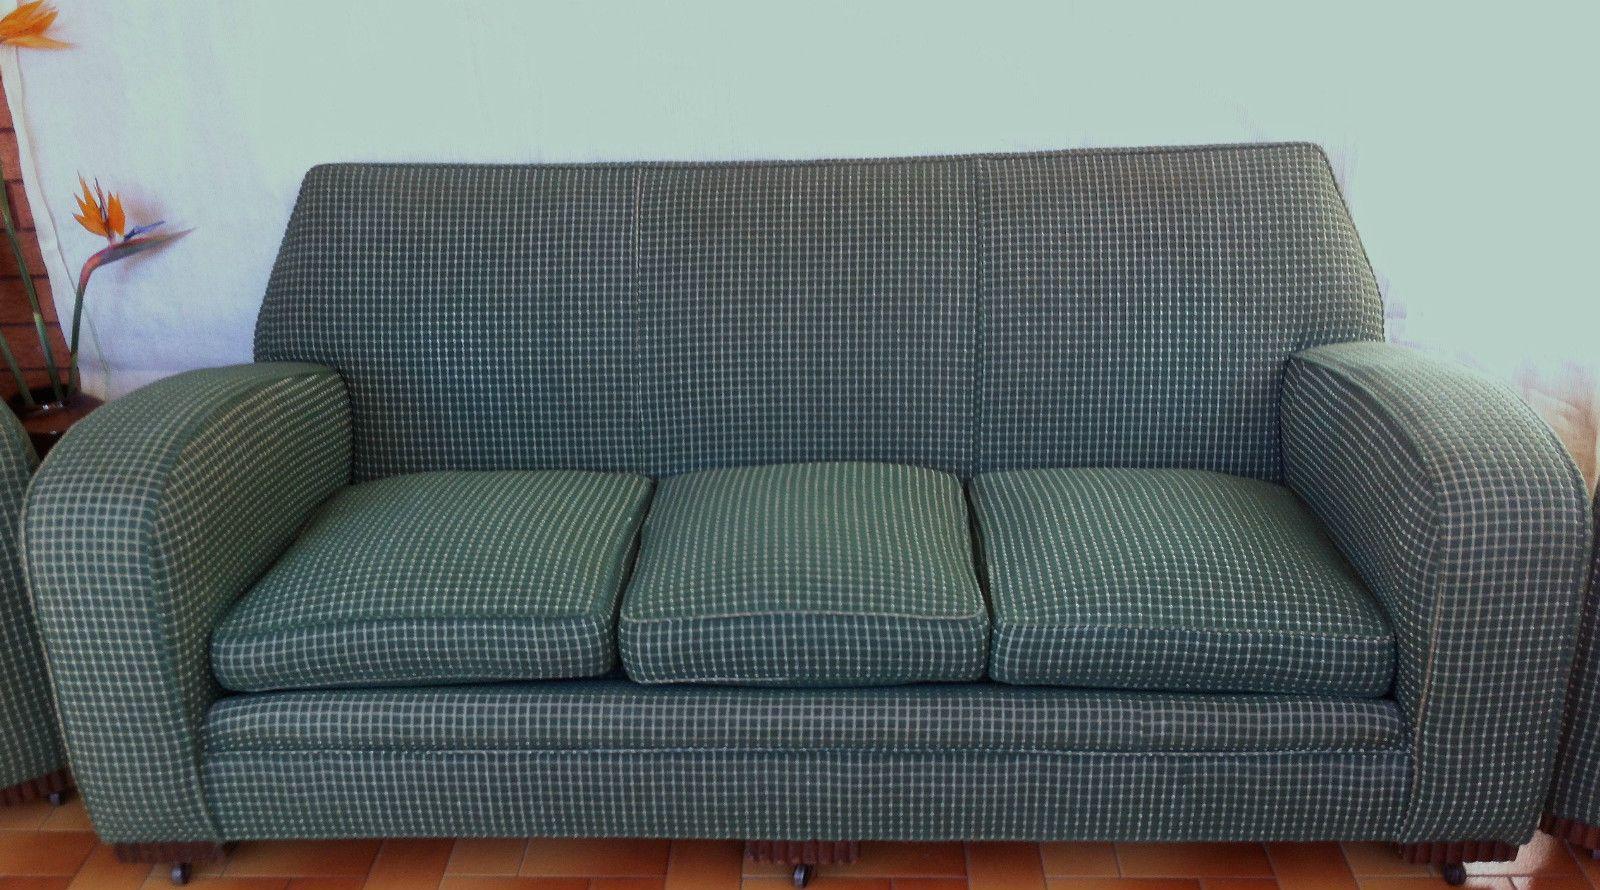 Original art deco sofa stamped 1920 early century antique vintage green lounge retro furniture - Deco lounge parket ...